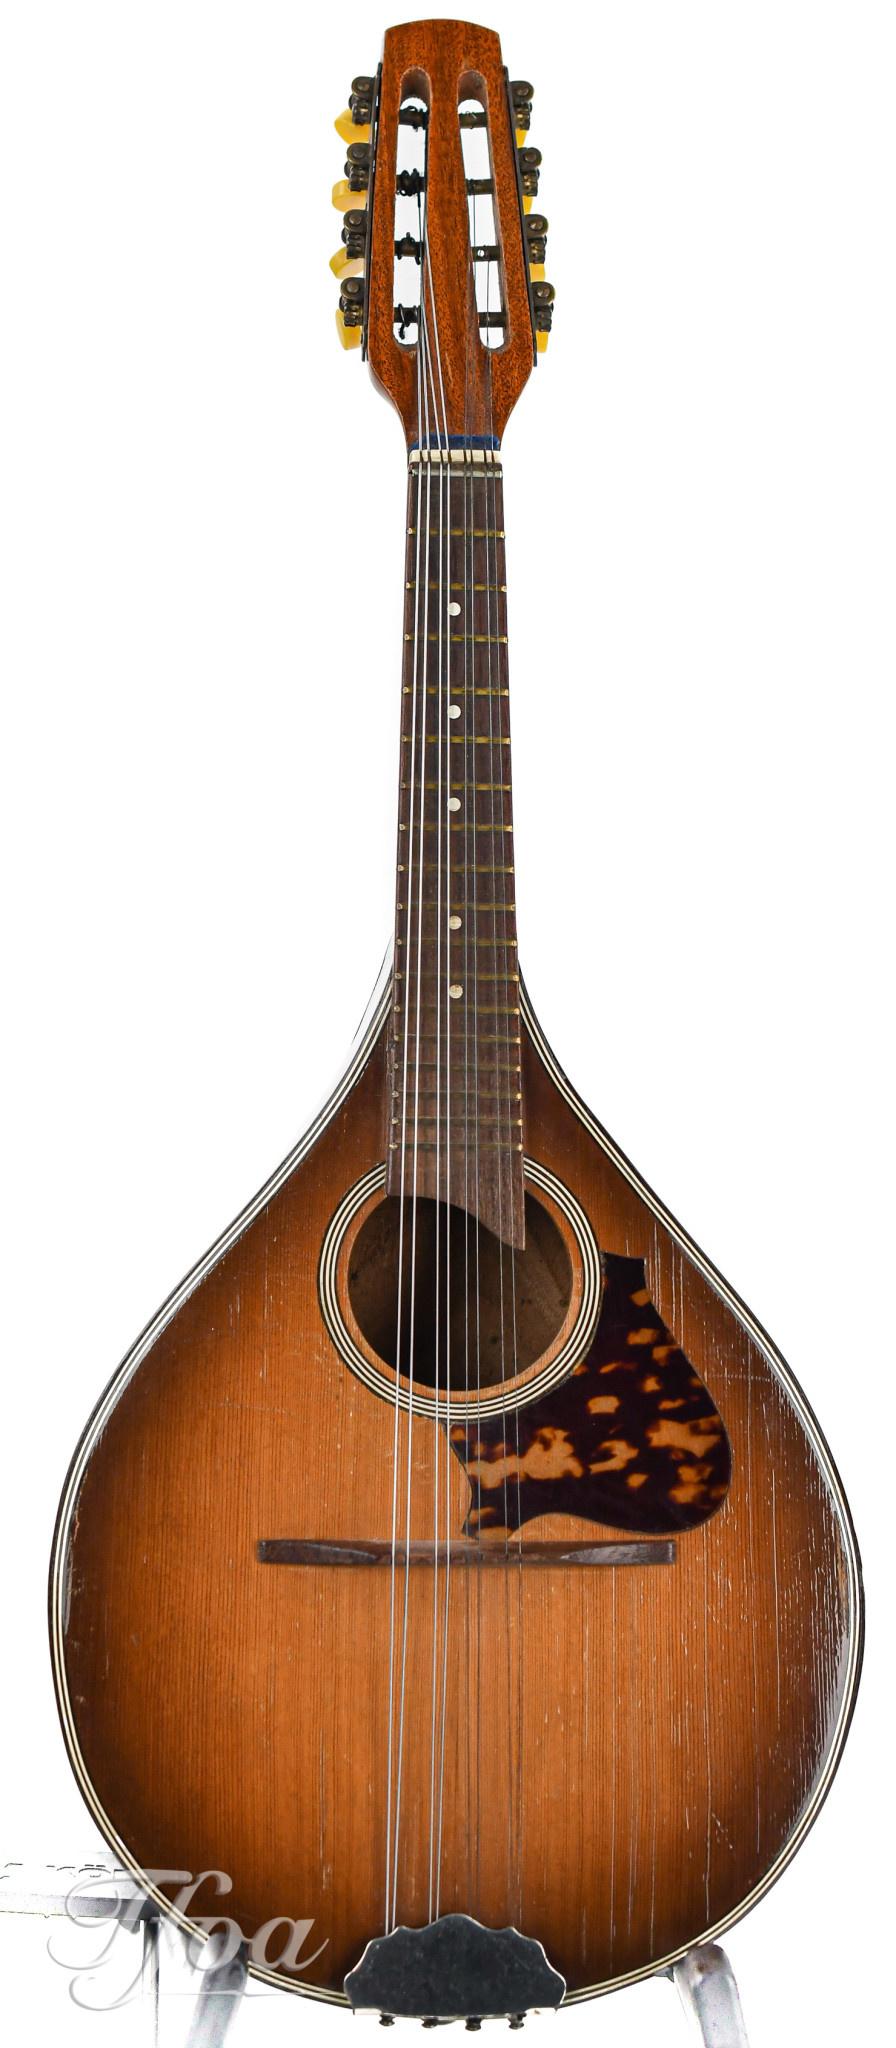 DiMauro Vintage Model 10 Muguet Mandolin 1940-60s